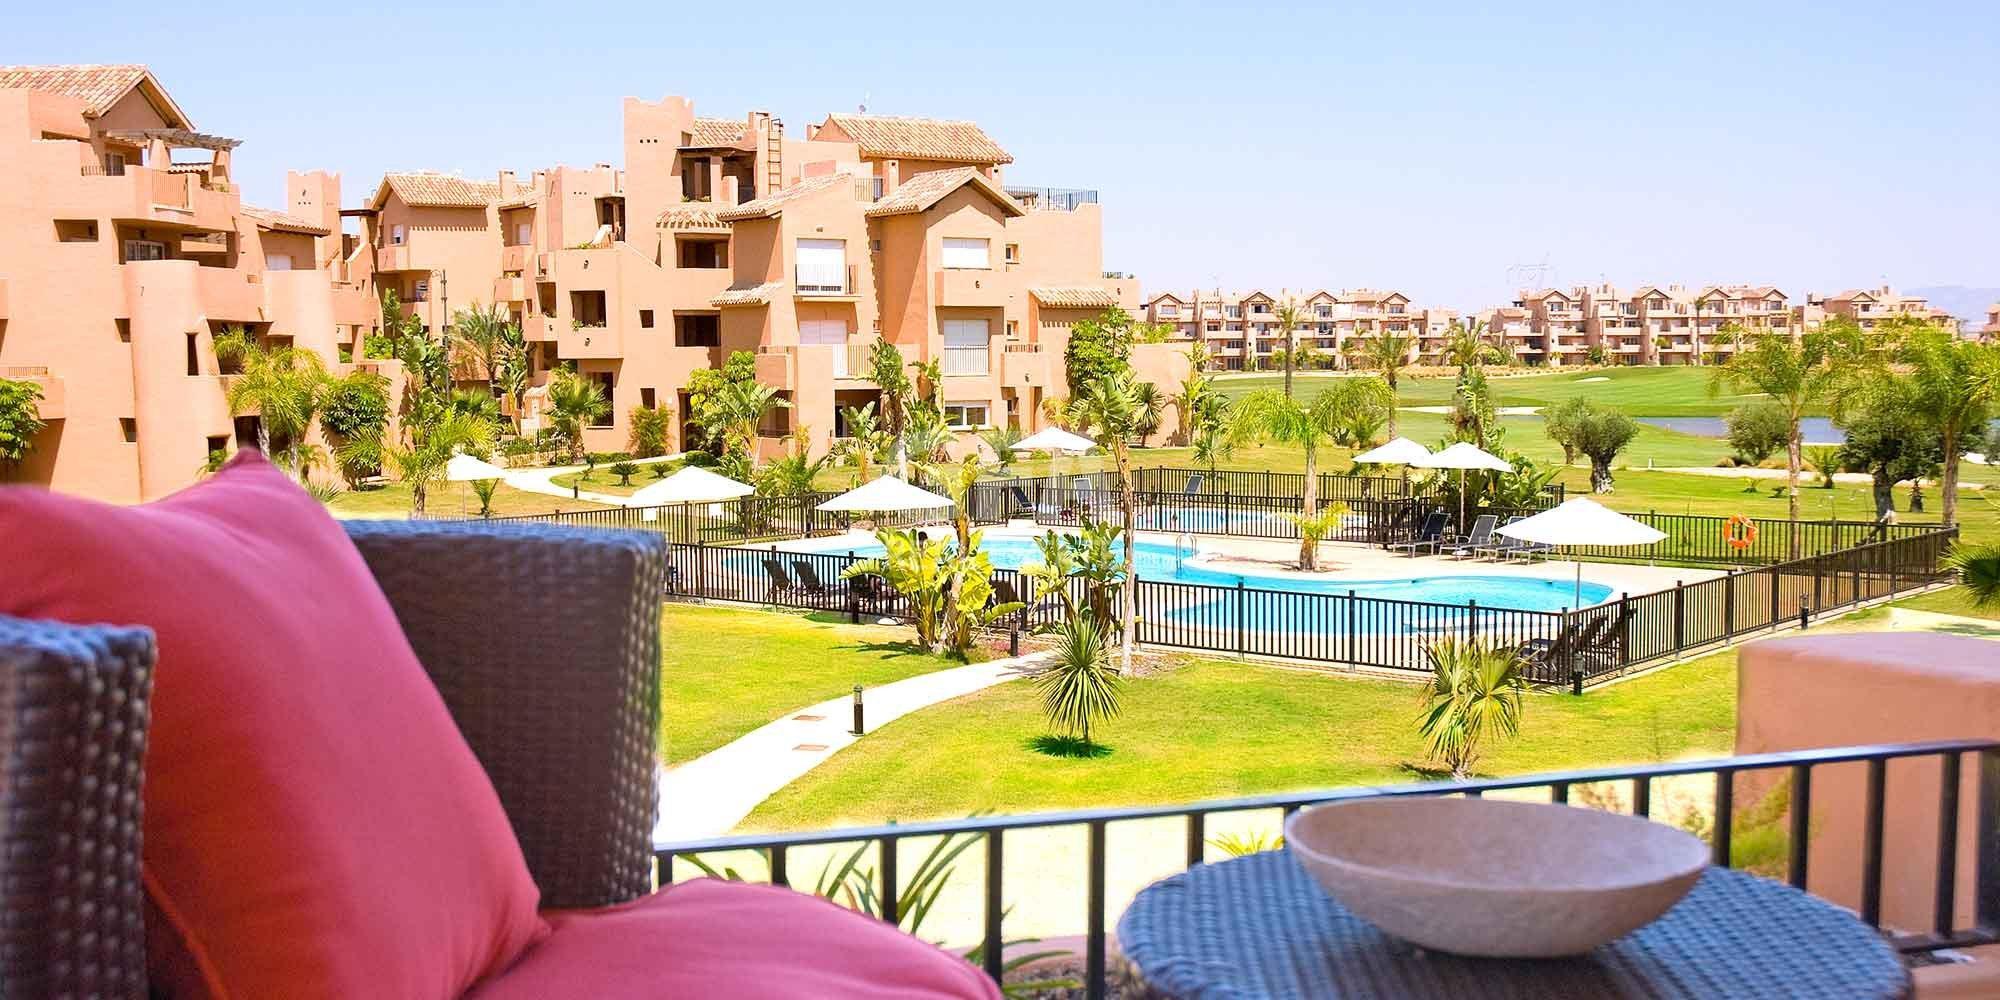 Residencial obra nueva Mar Menor Golf Resort vista exterior desde balcón